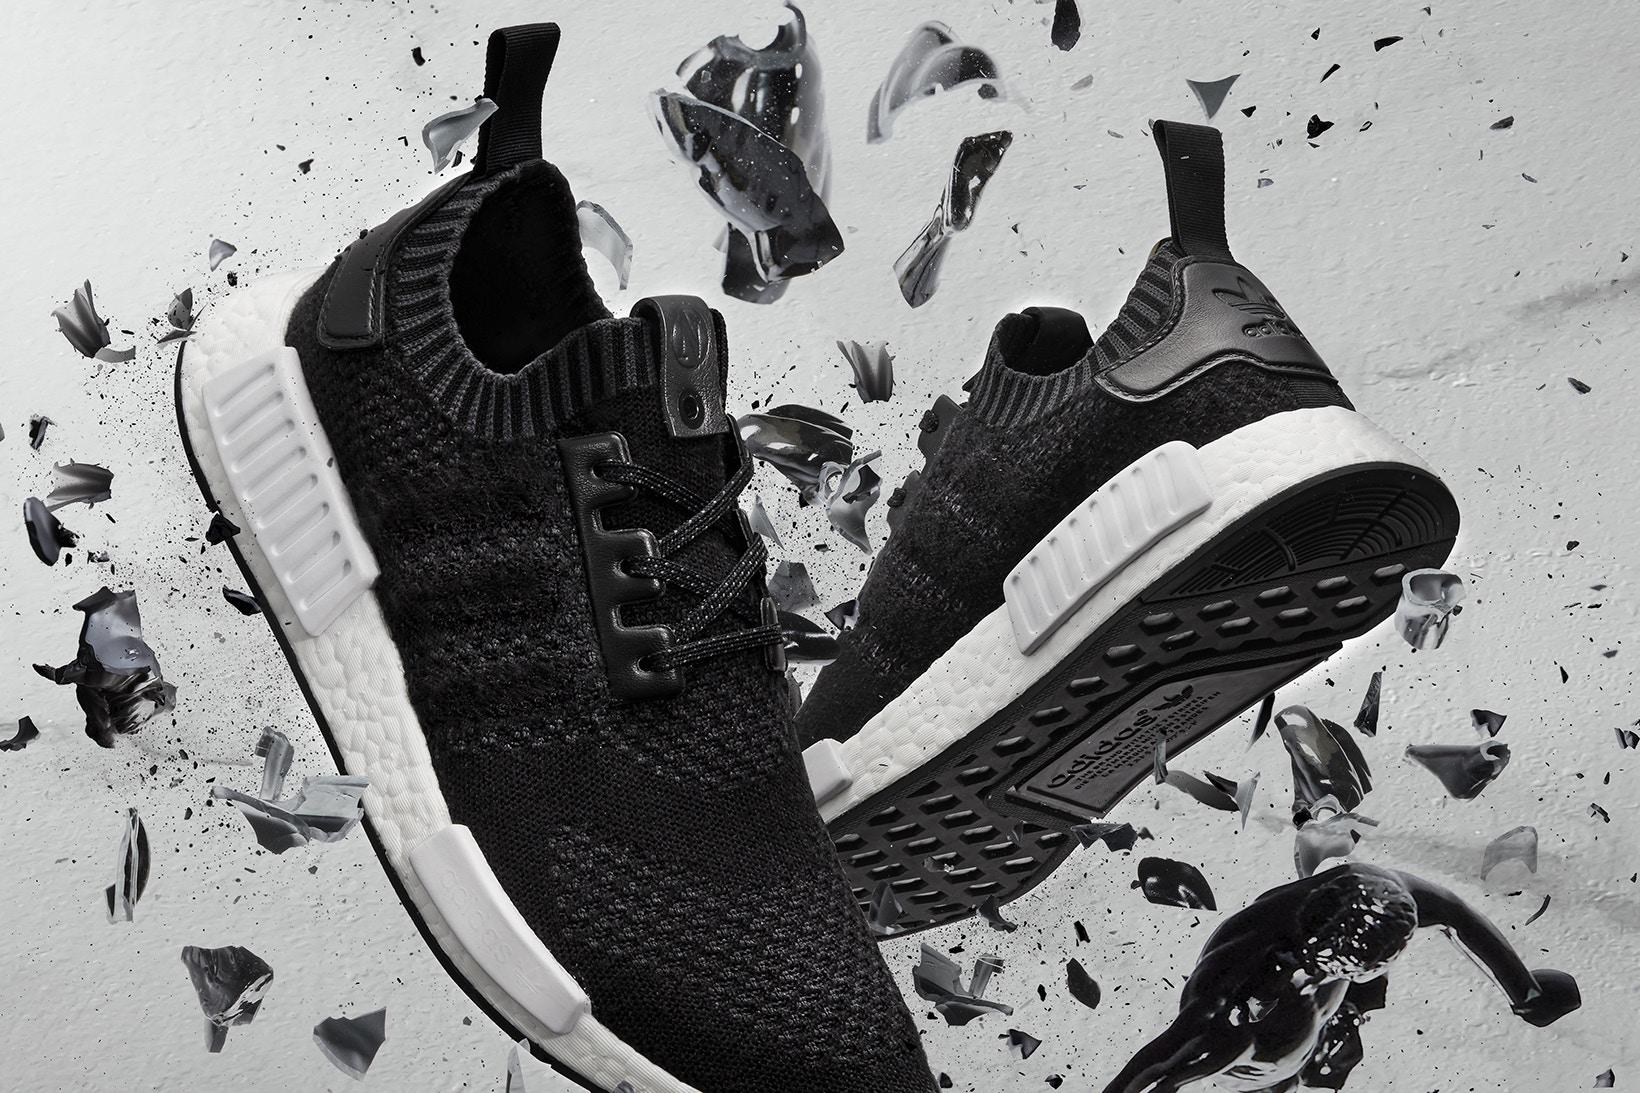 adidas-consortium-sneaker-exchange-invincible-a-ma-maniere-5.jpg